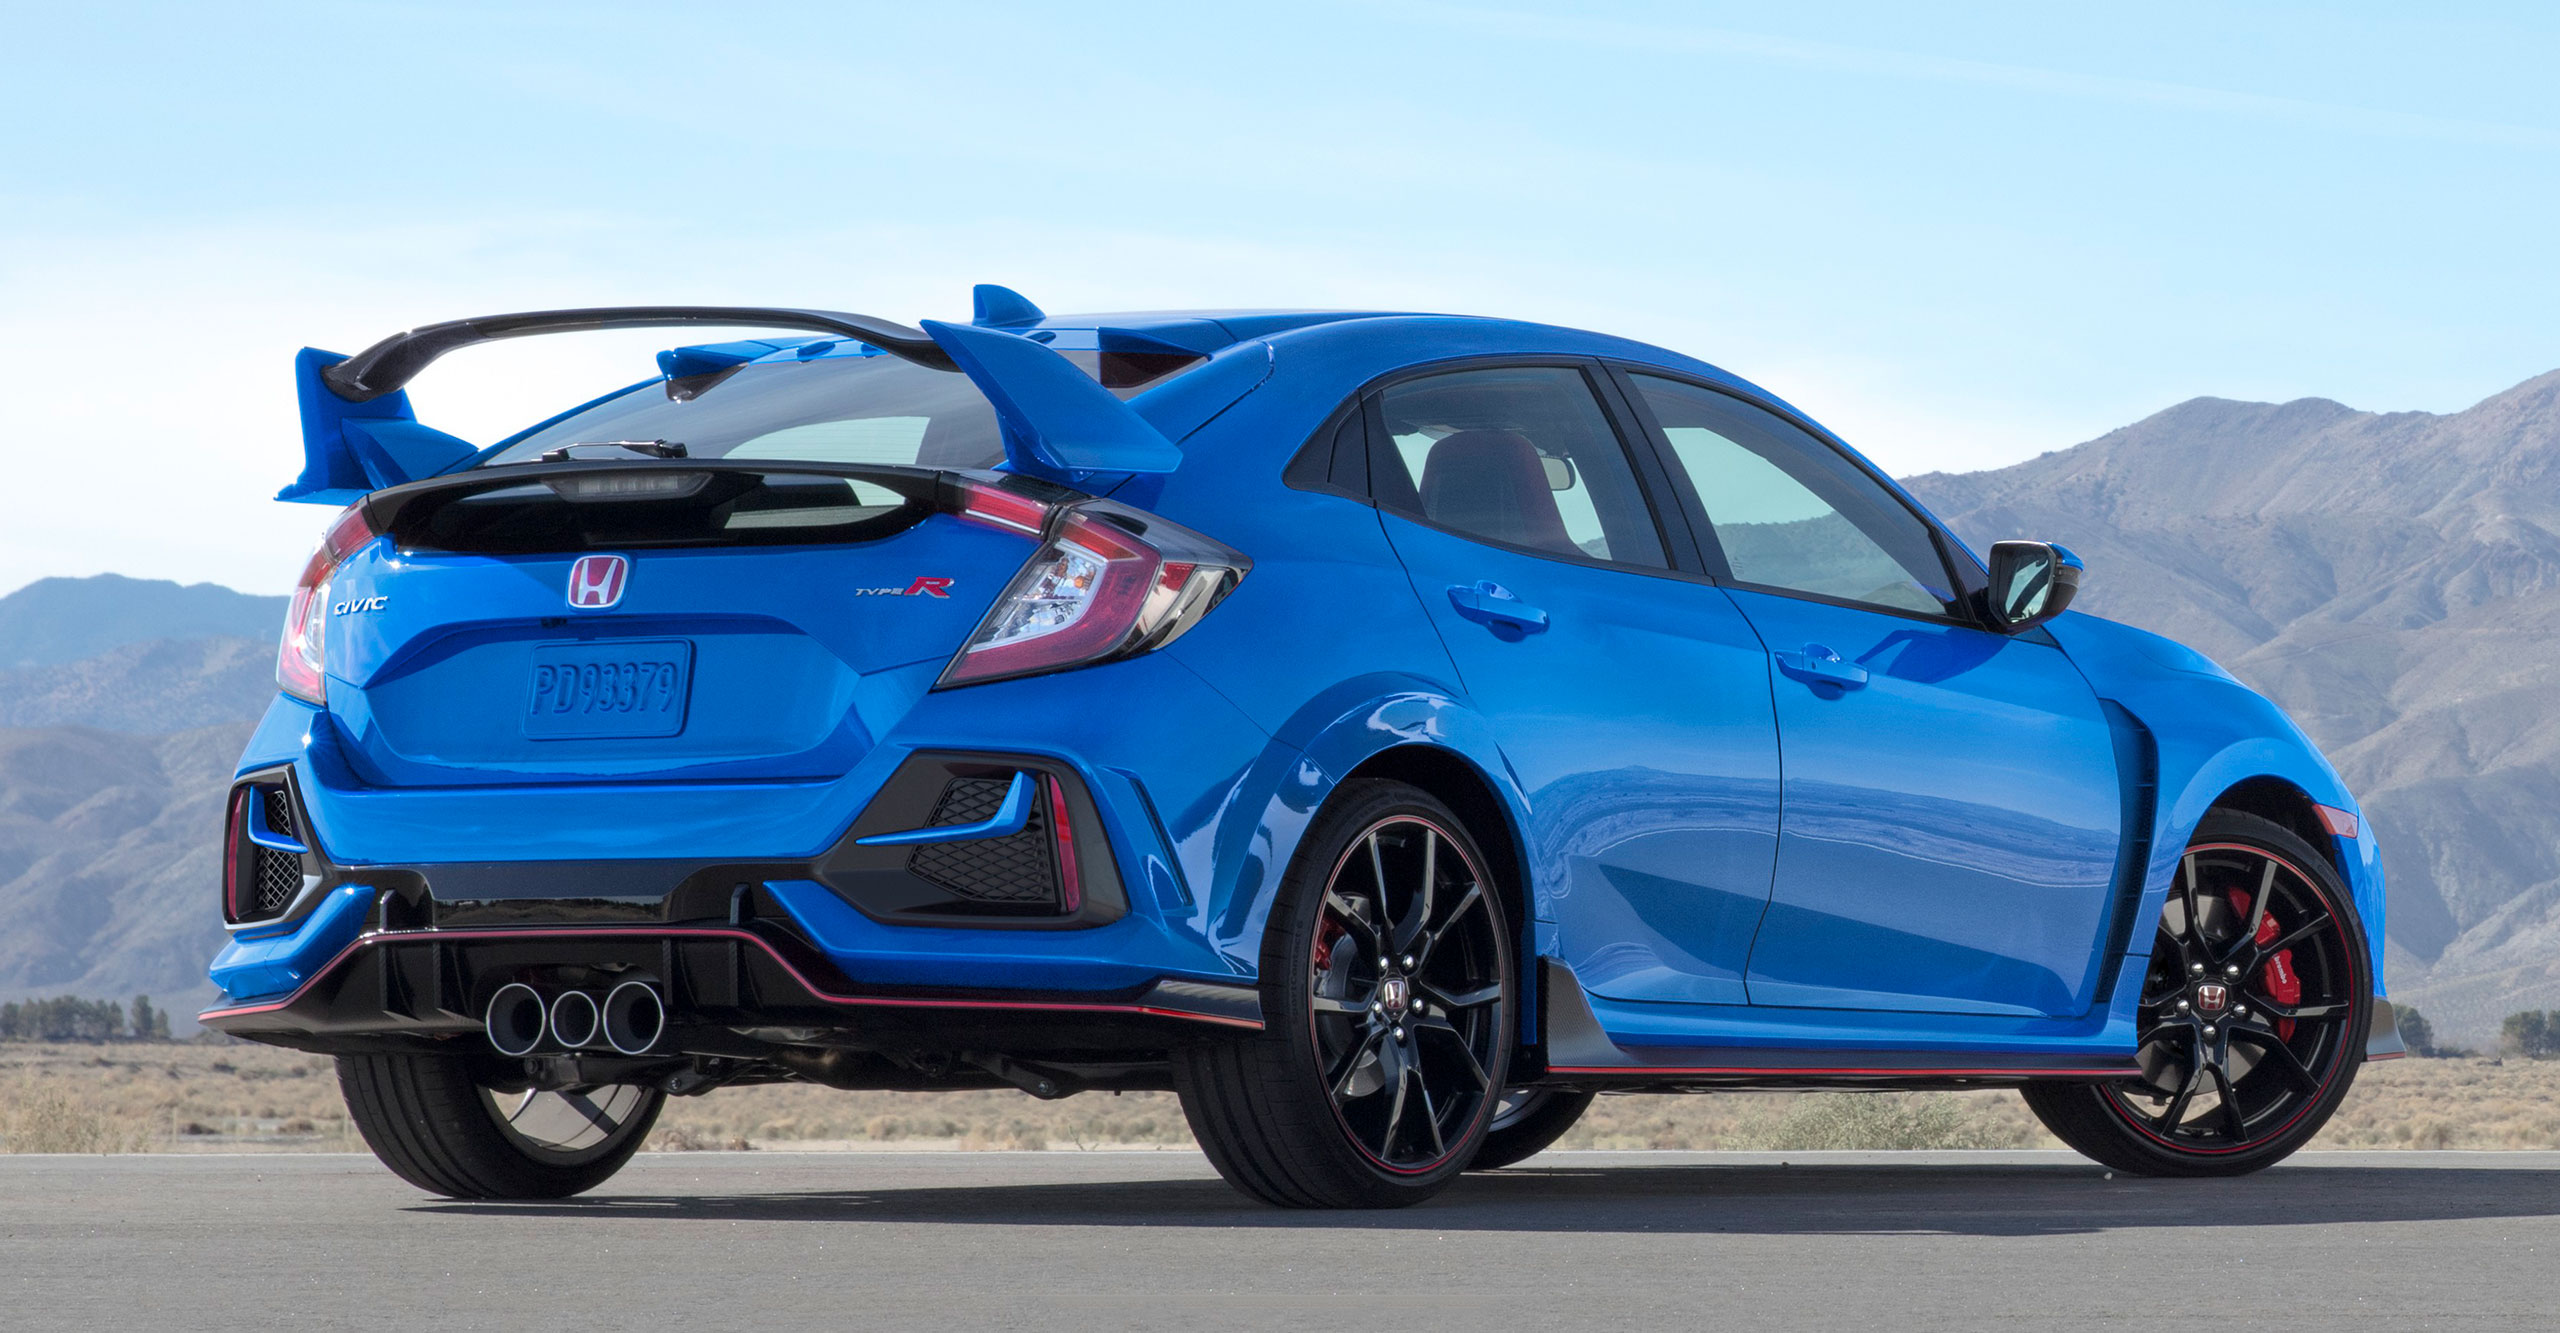 Kelebihan Honda Civic Fk8 Review